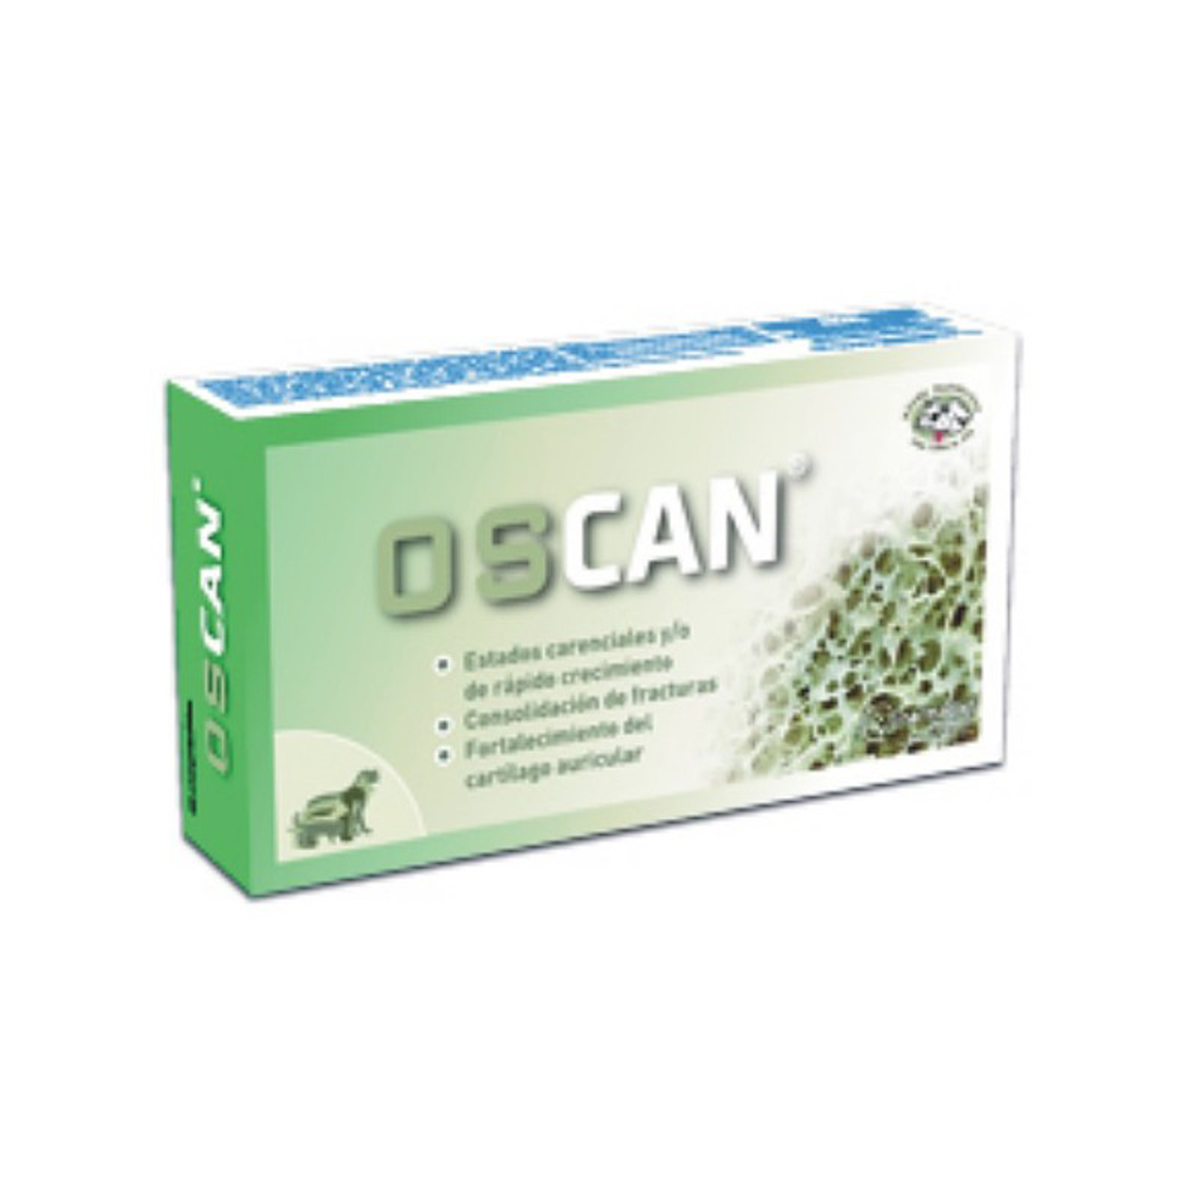 Oscan 60 Tablete